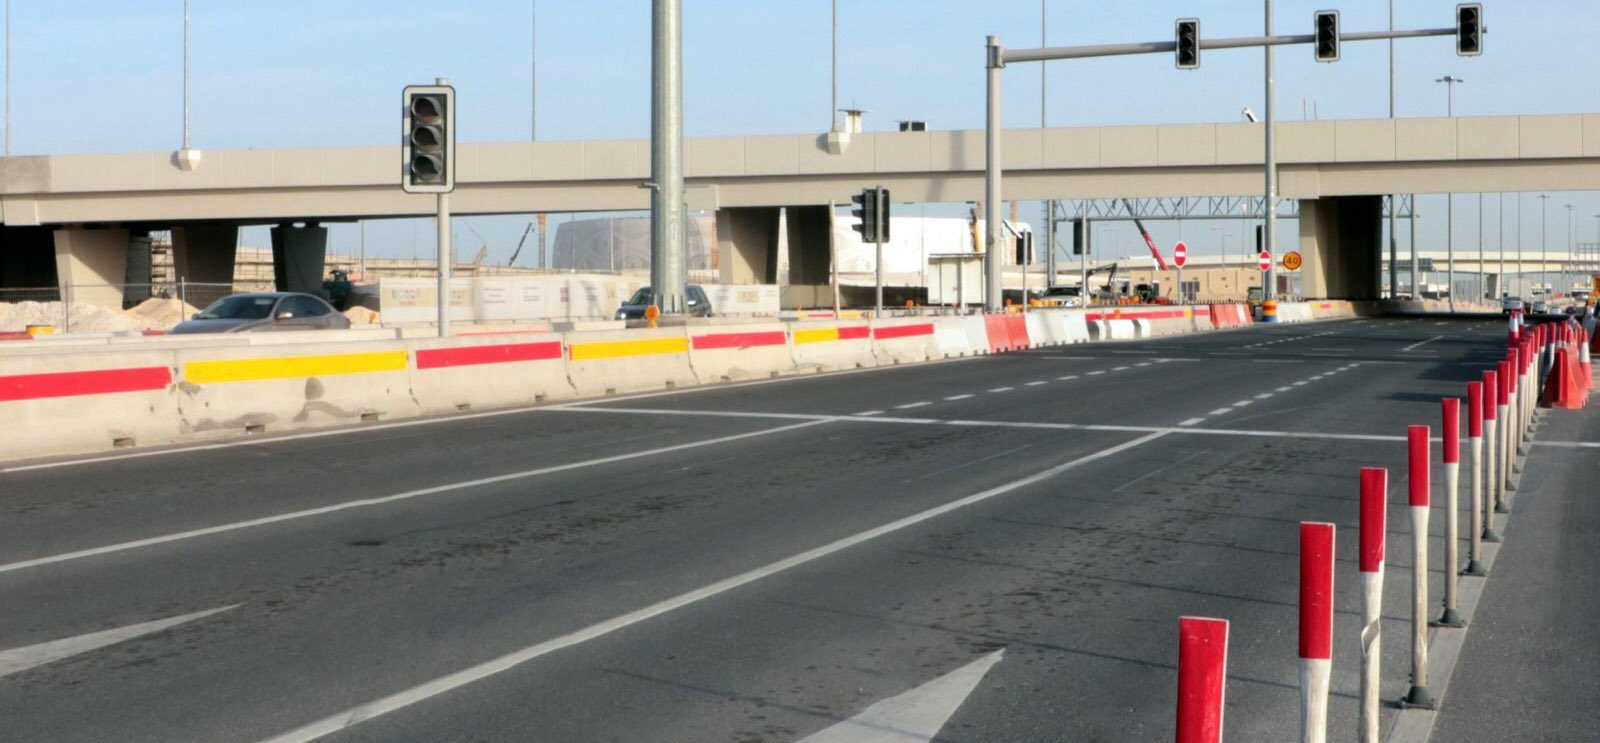 Partial opening of new bridge and underpass at Mesaimeer Interchange